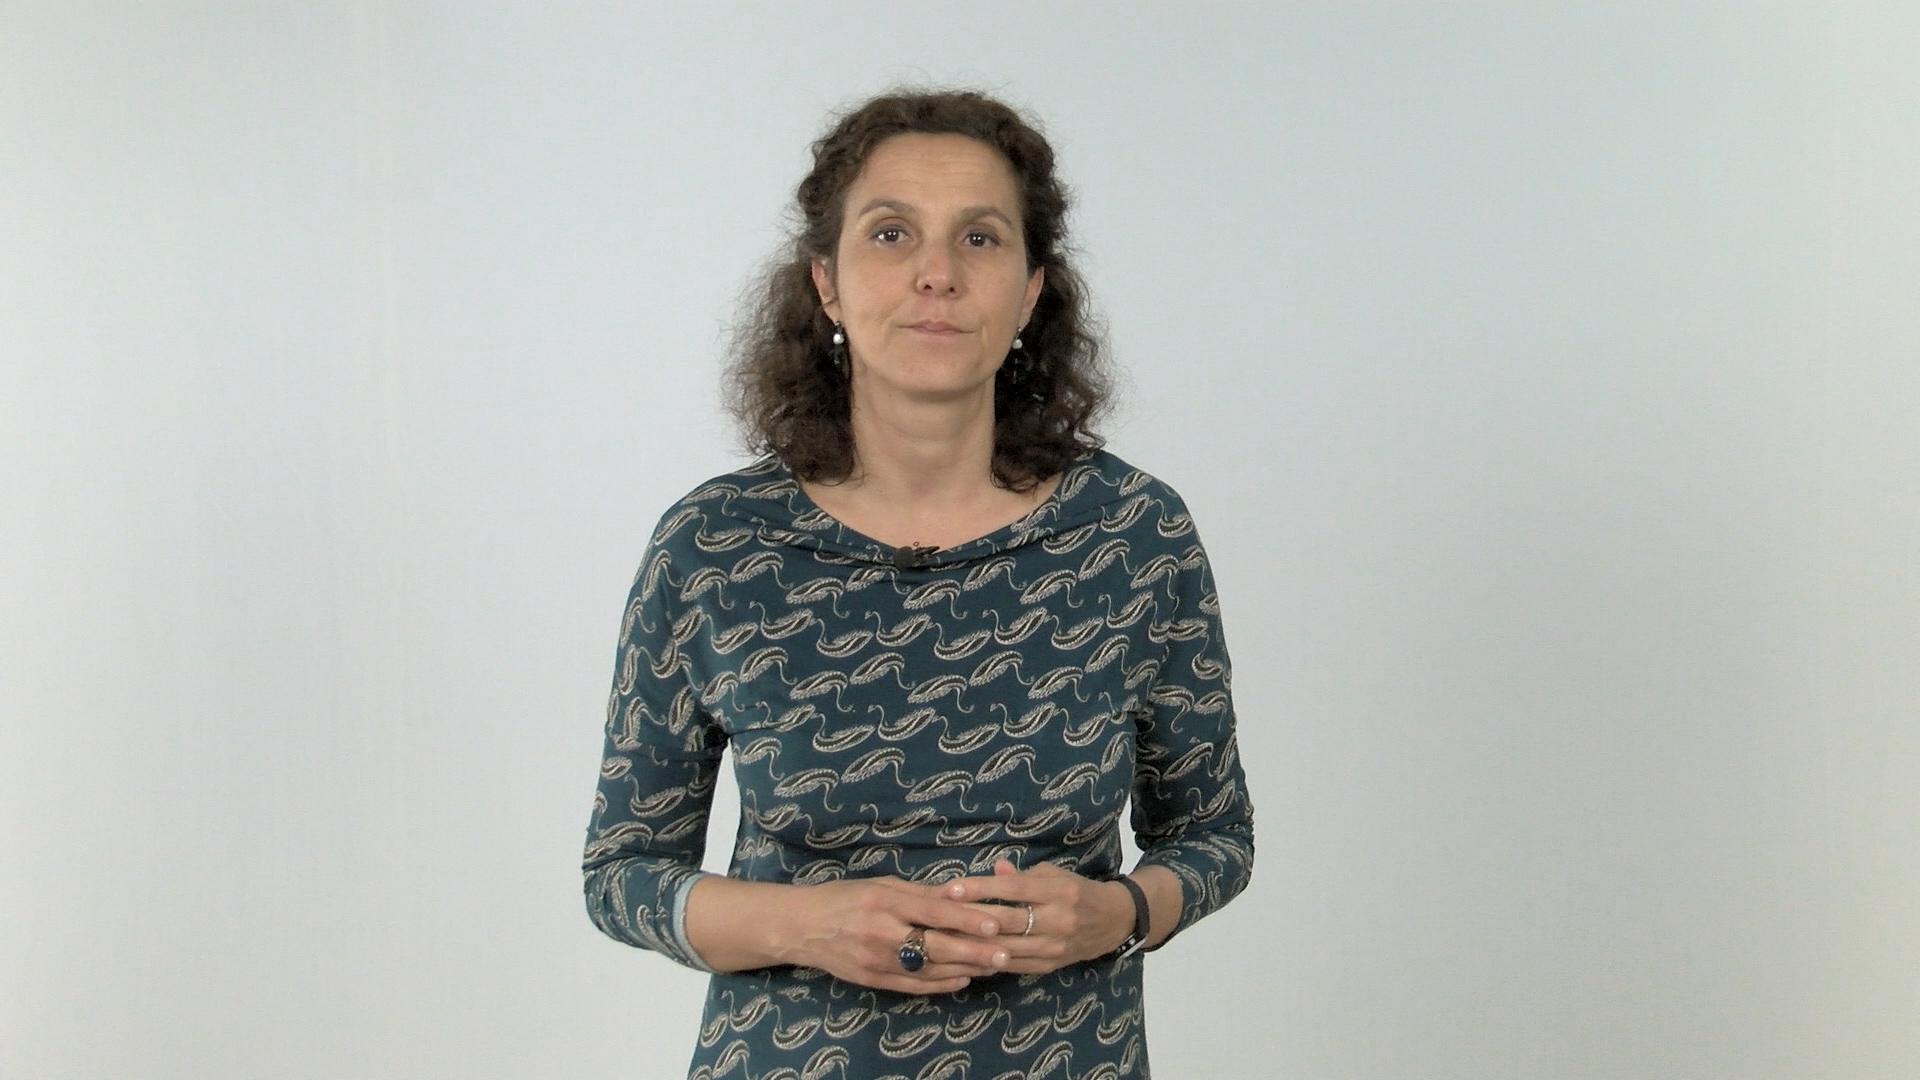 Irene Belmonte